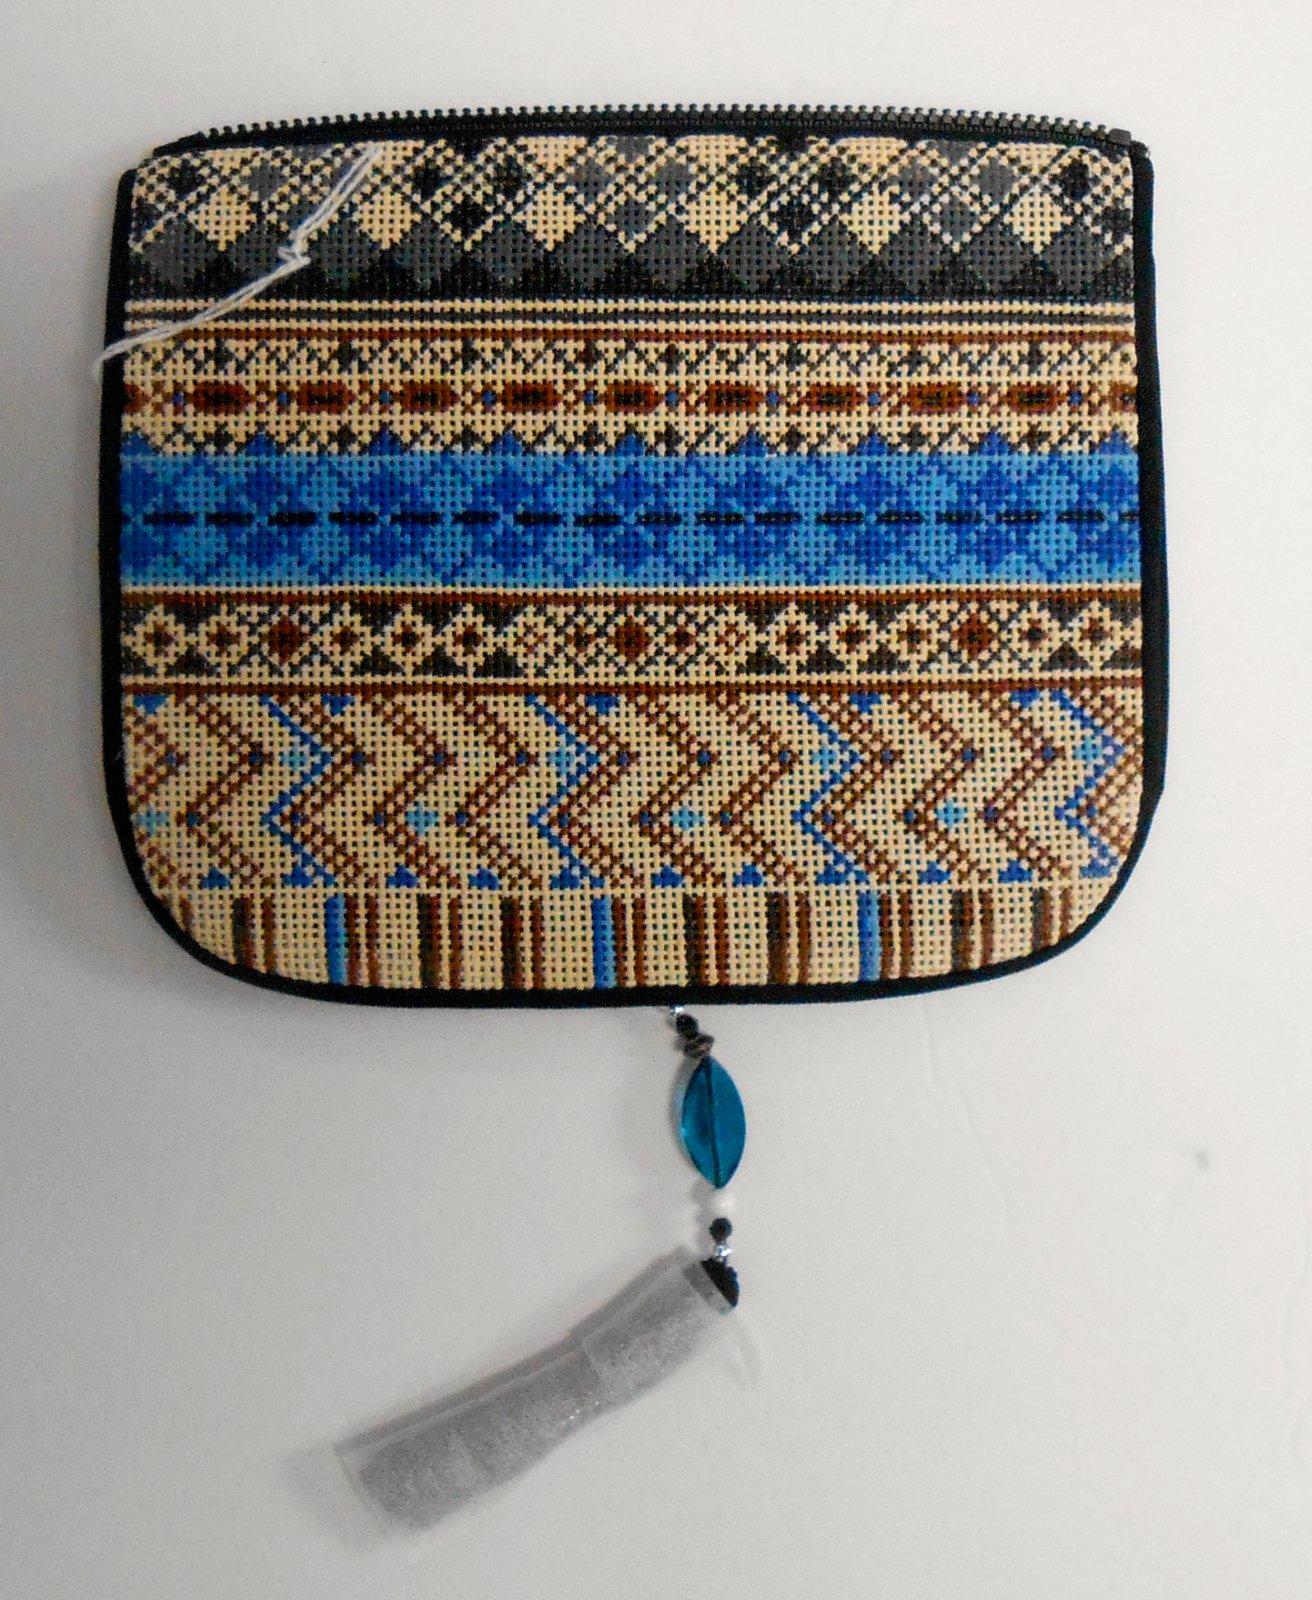 Black, Brown and Blue Geometric Purse Flap